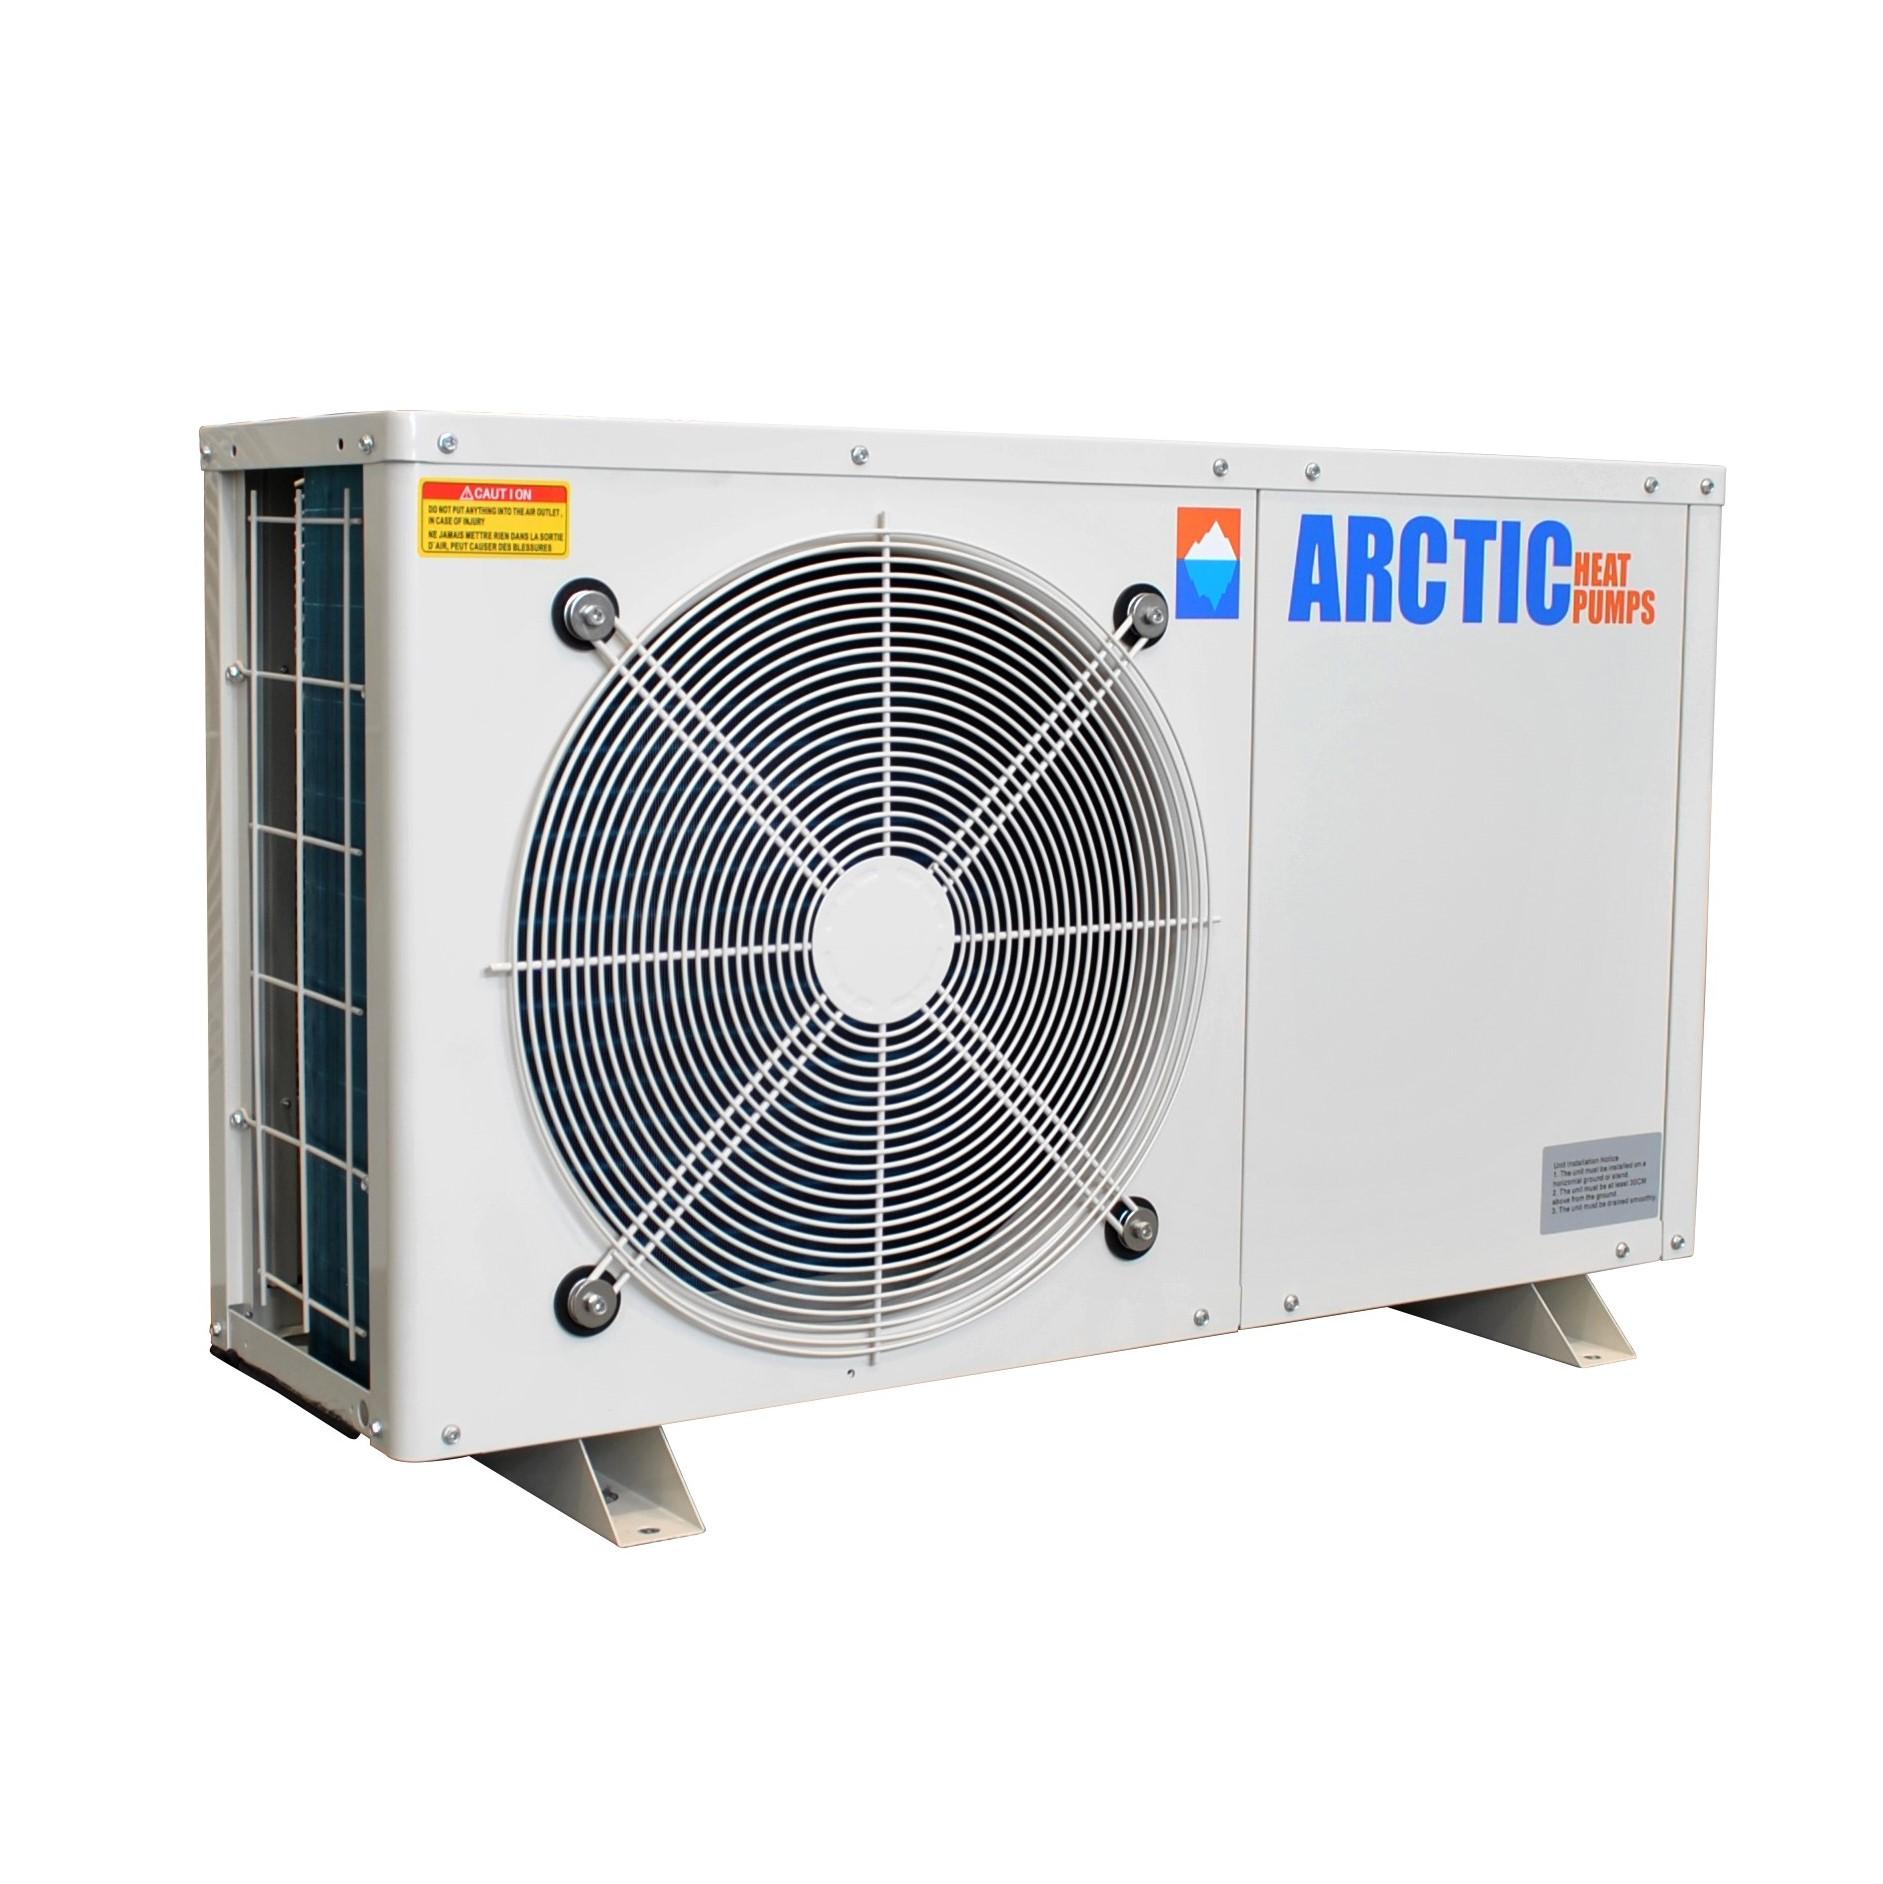 Arctic Heat Pump 015ZA/B